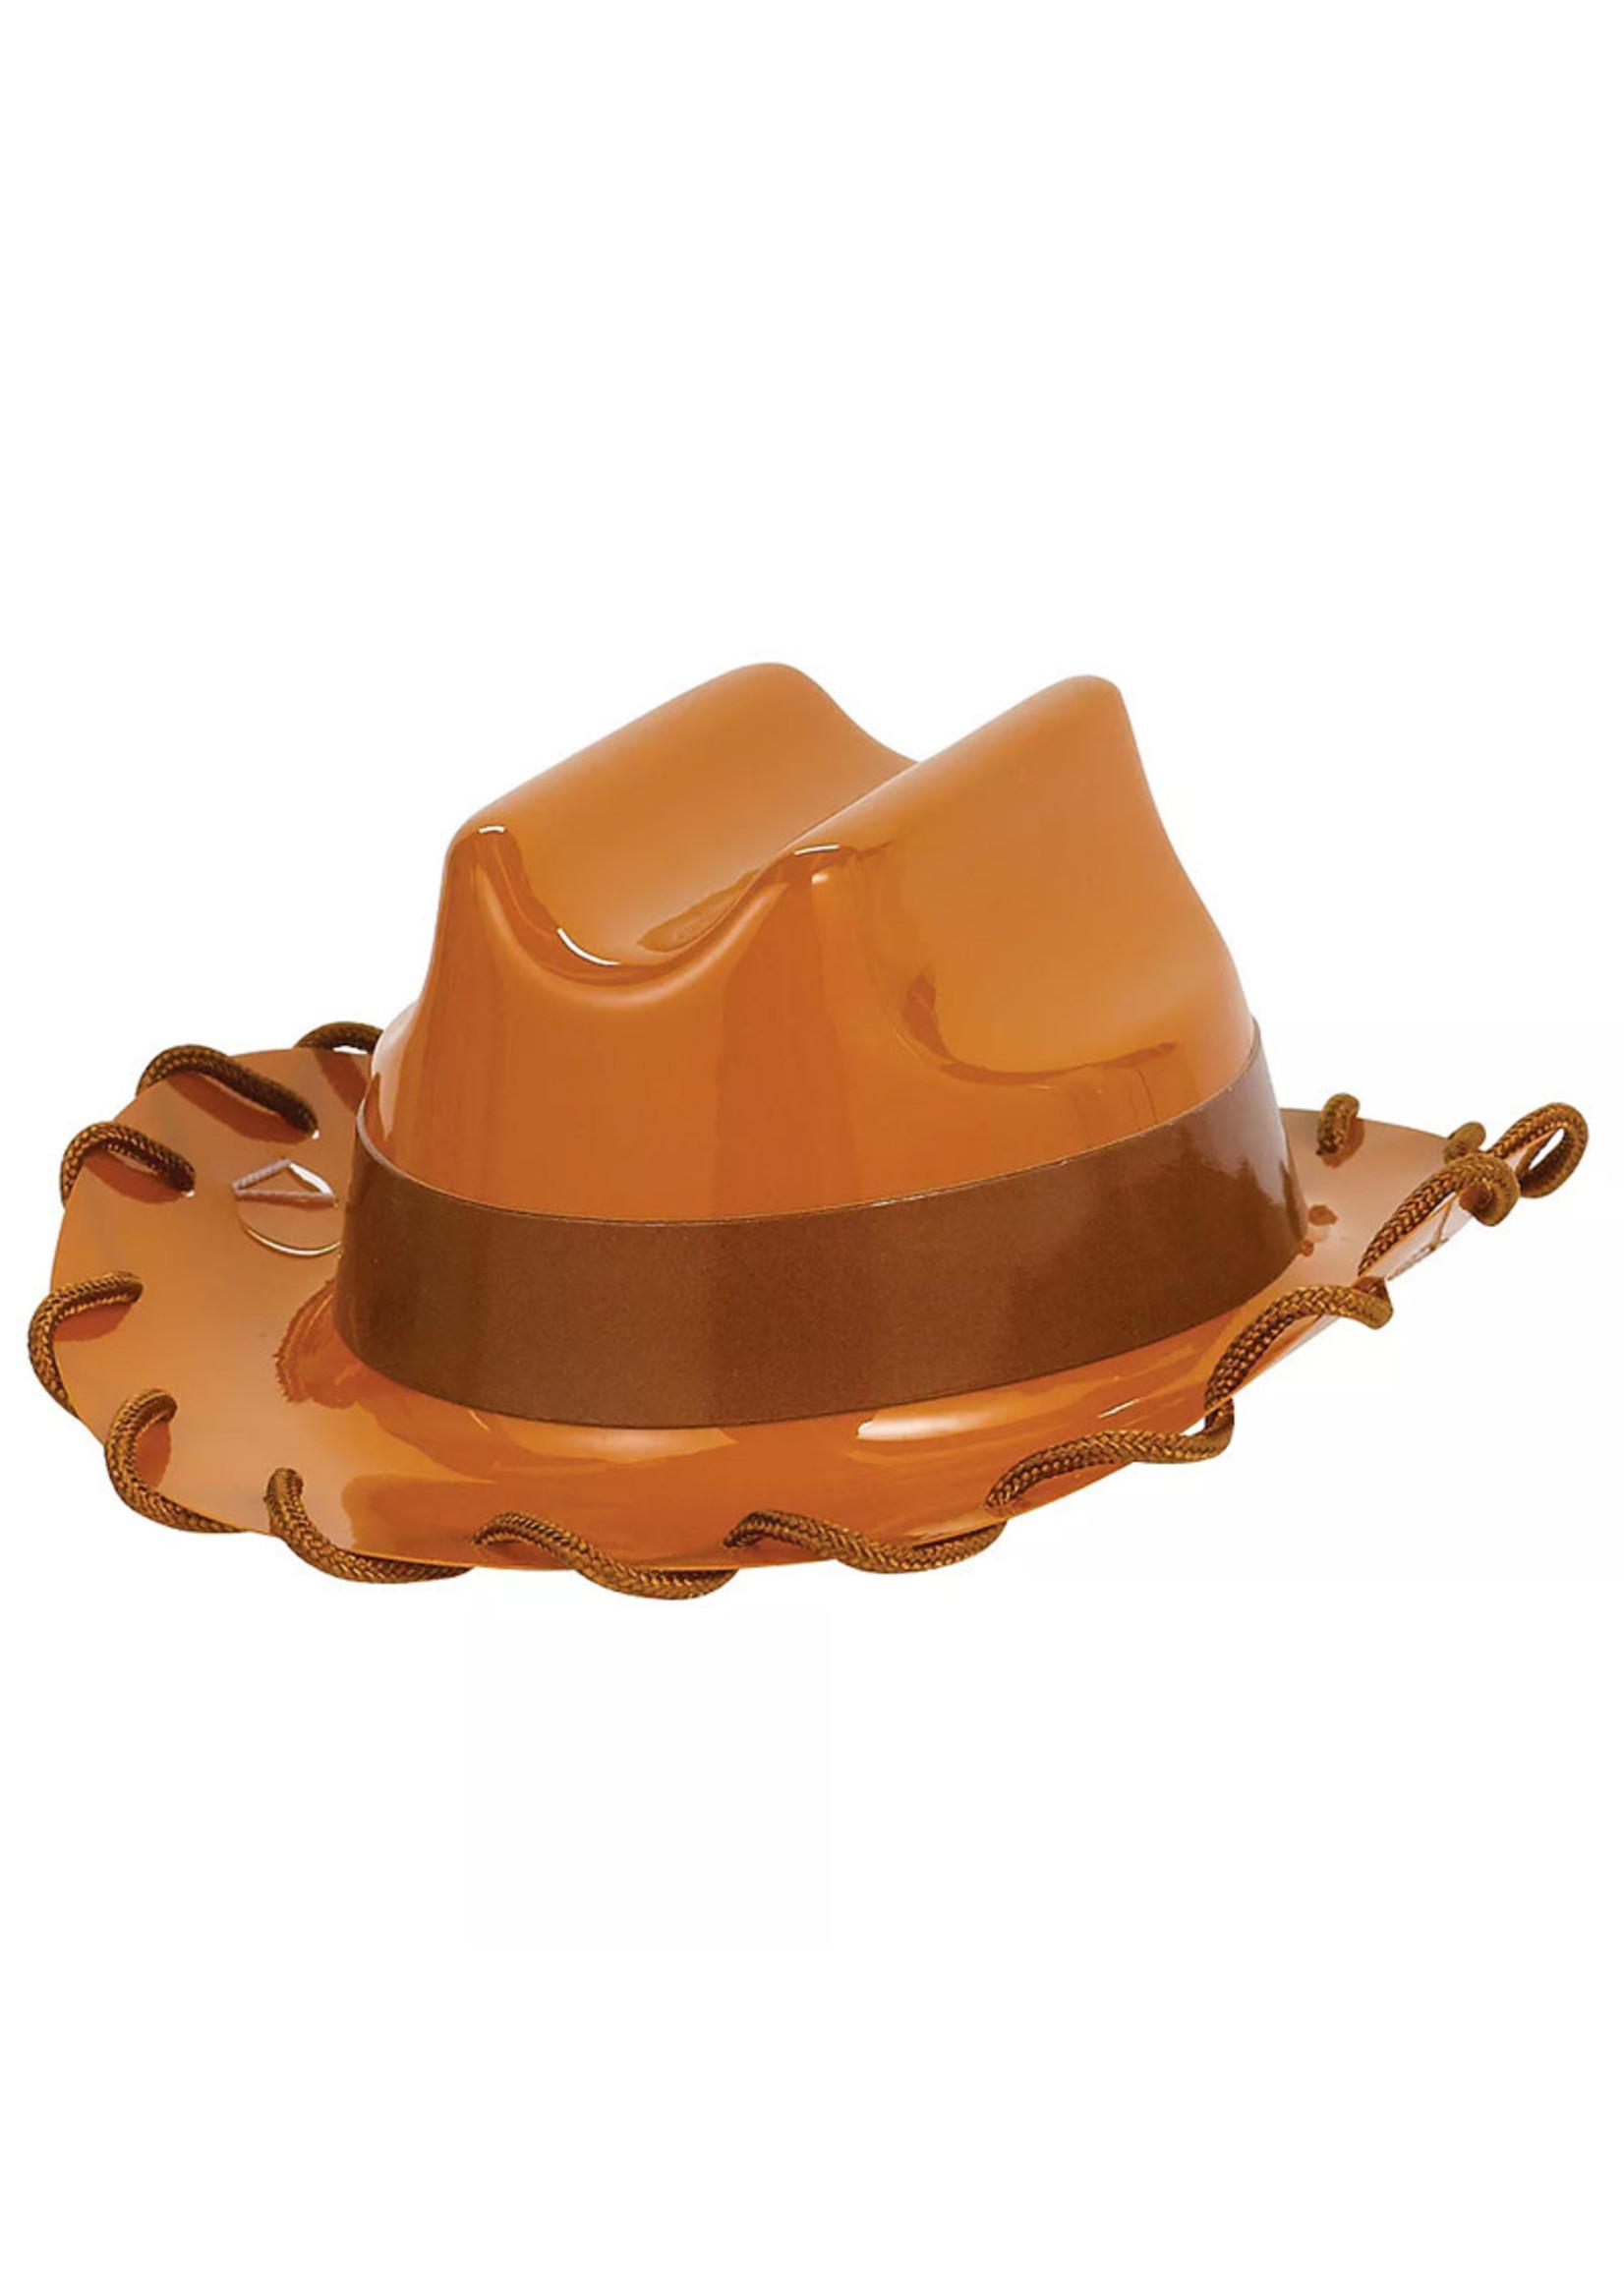 Mini Woody Cowboy Hats 4ct - Toy Story 4